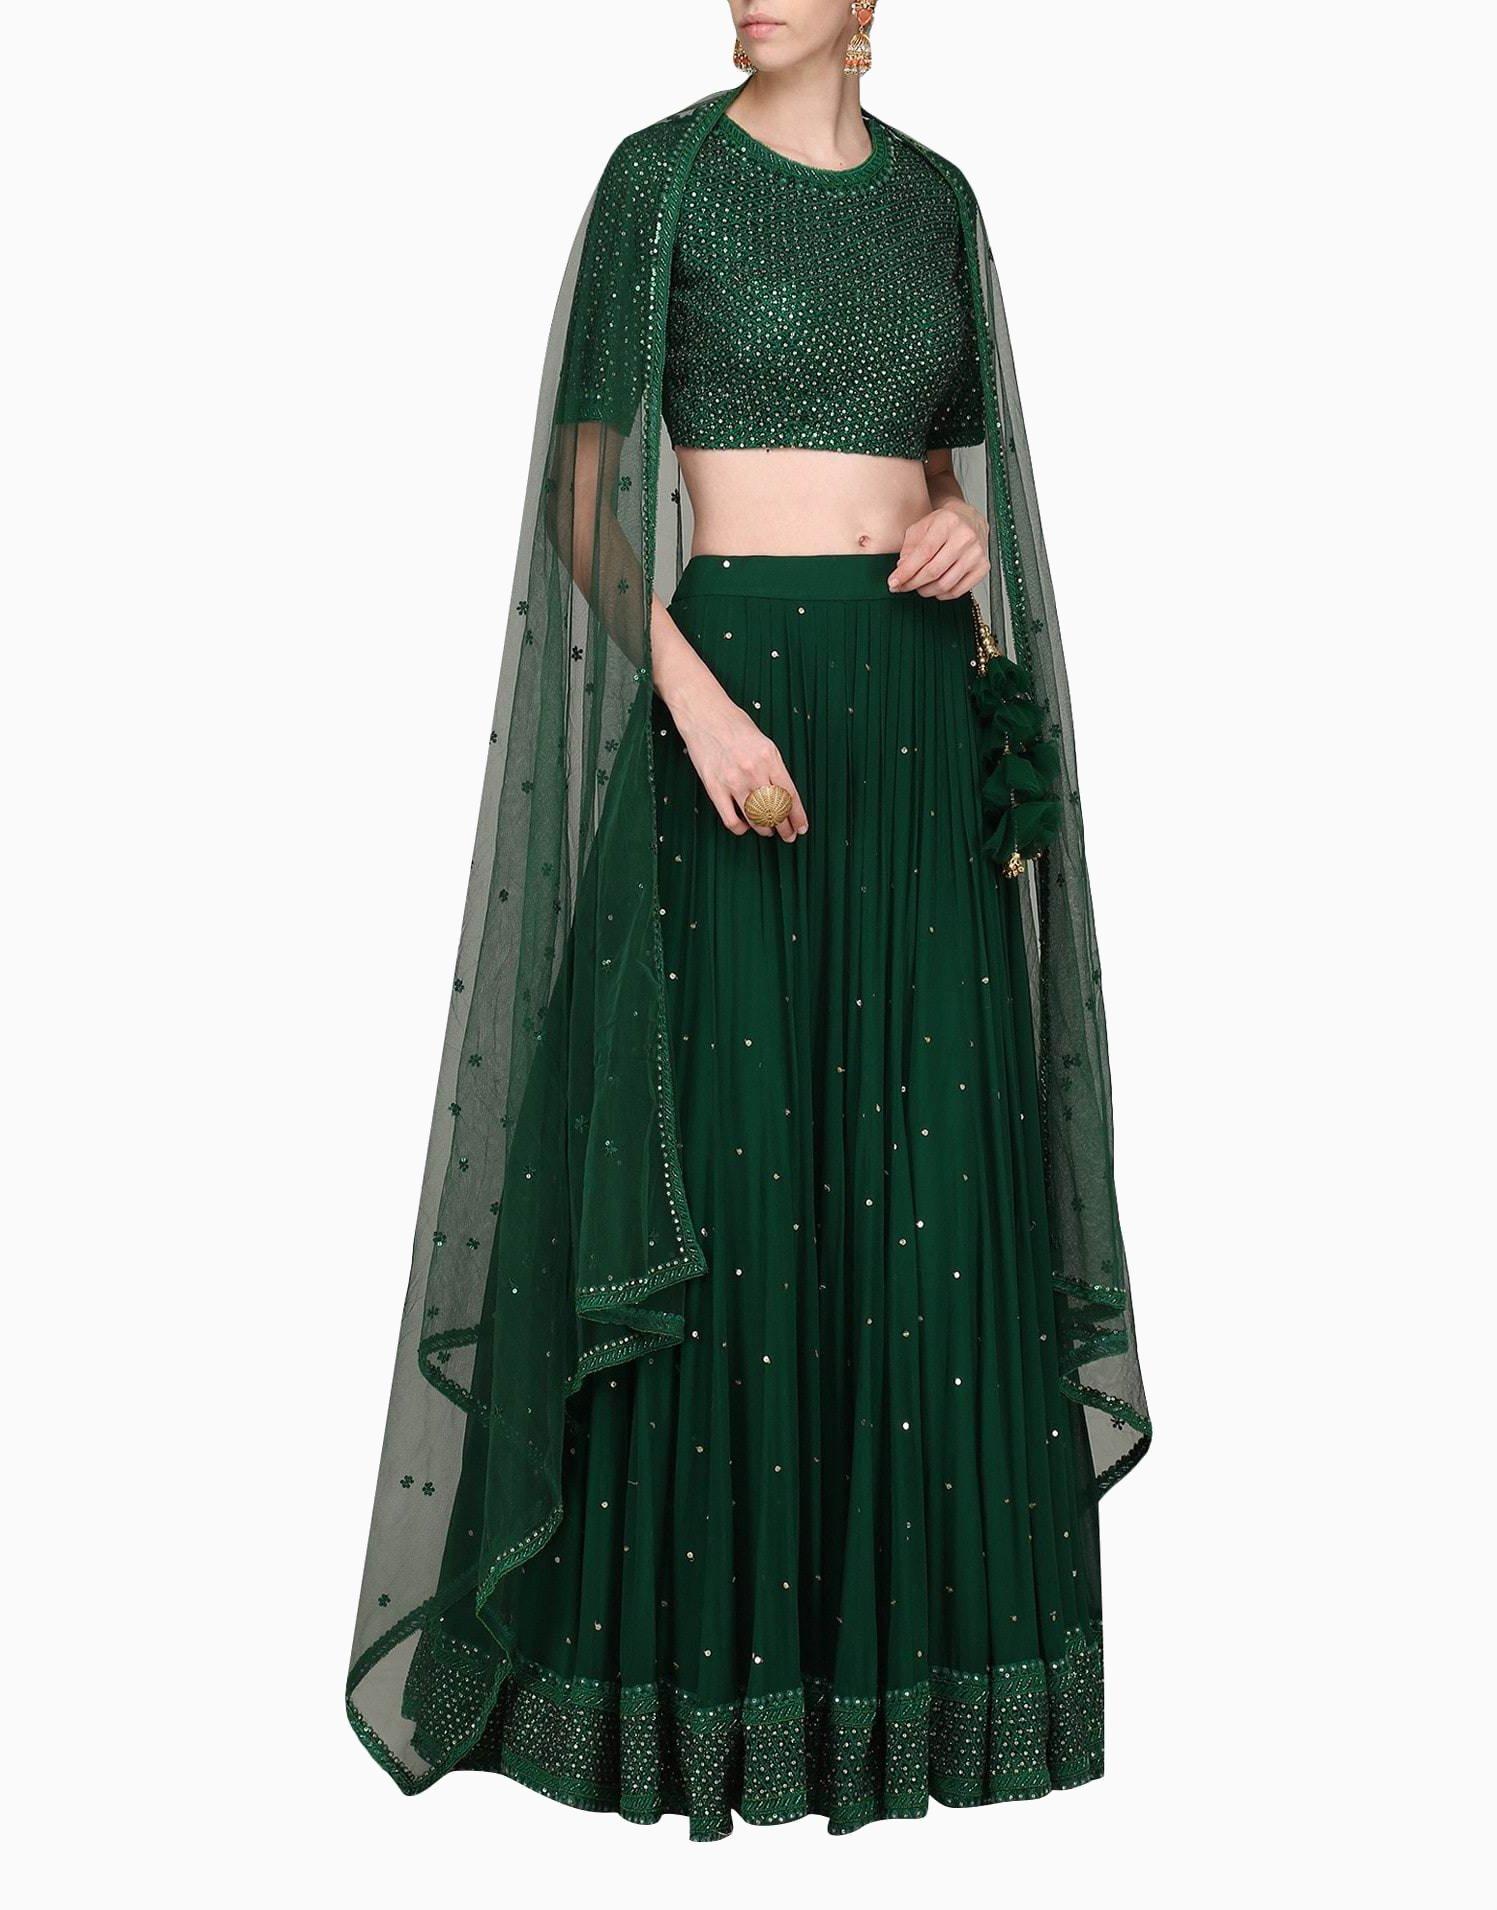 a8686618b6 Dark Green Lehenga Set With Dupatta in 2019   Products   Green ...